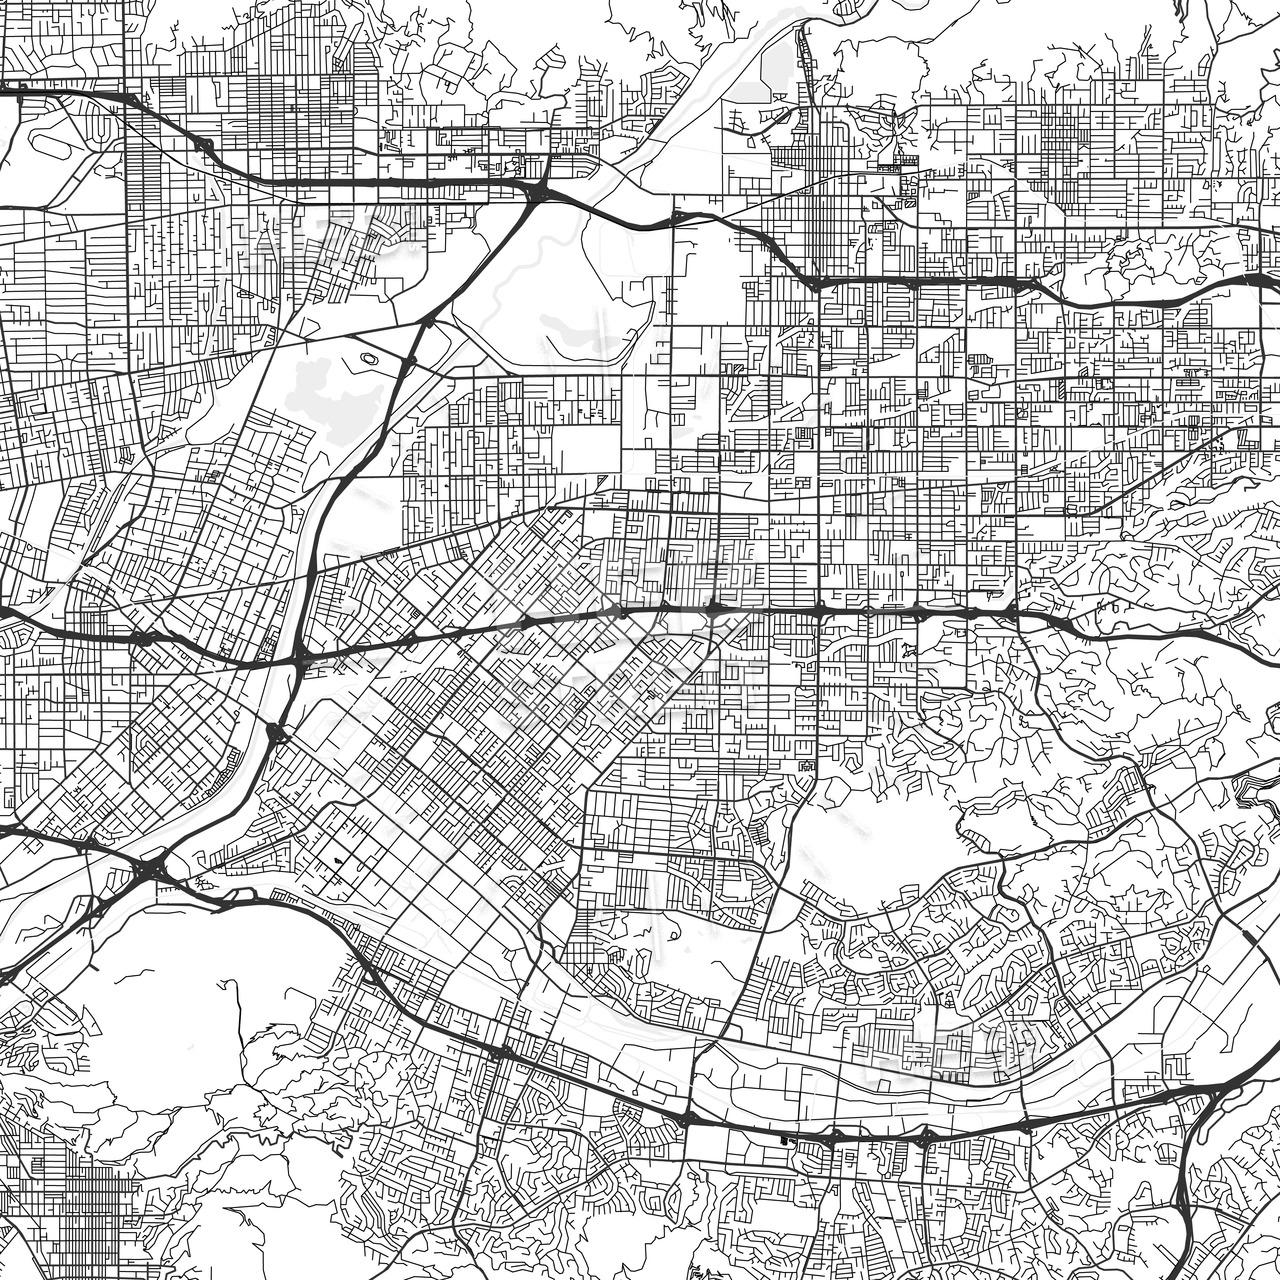 West Covina, California - Area Map - Light | Hebstreits - West Covina California Map